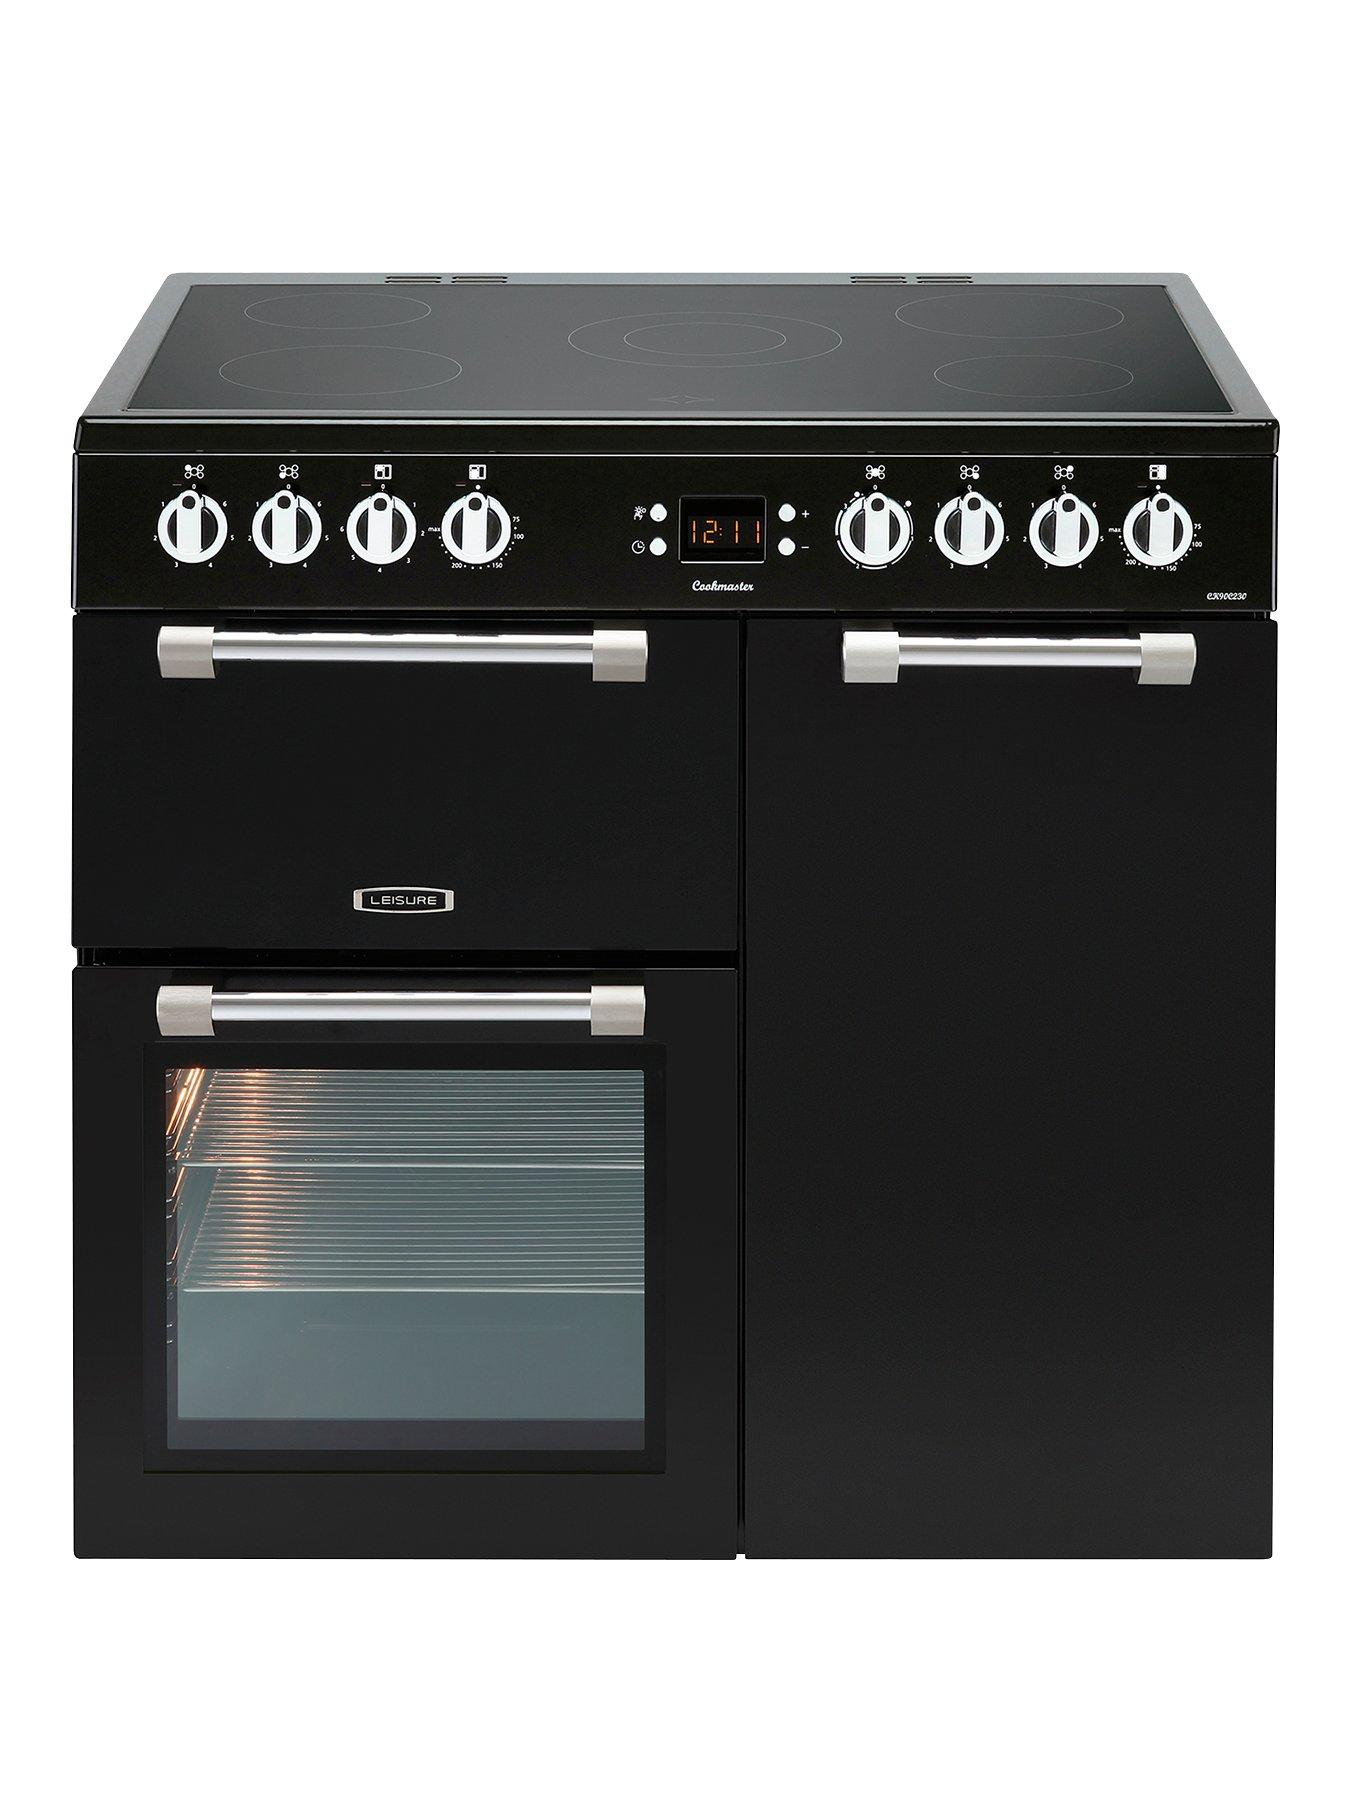 Leisure Ck90c230k Cookmaster 90cm Electric Range Cooker